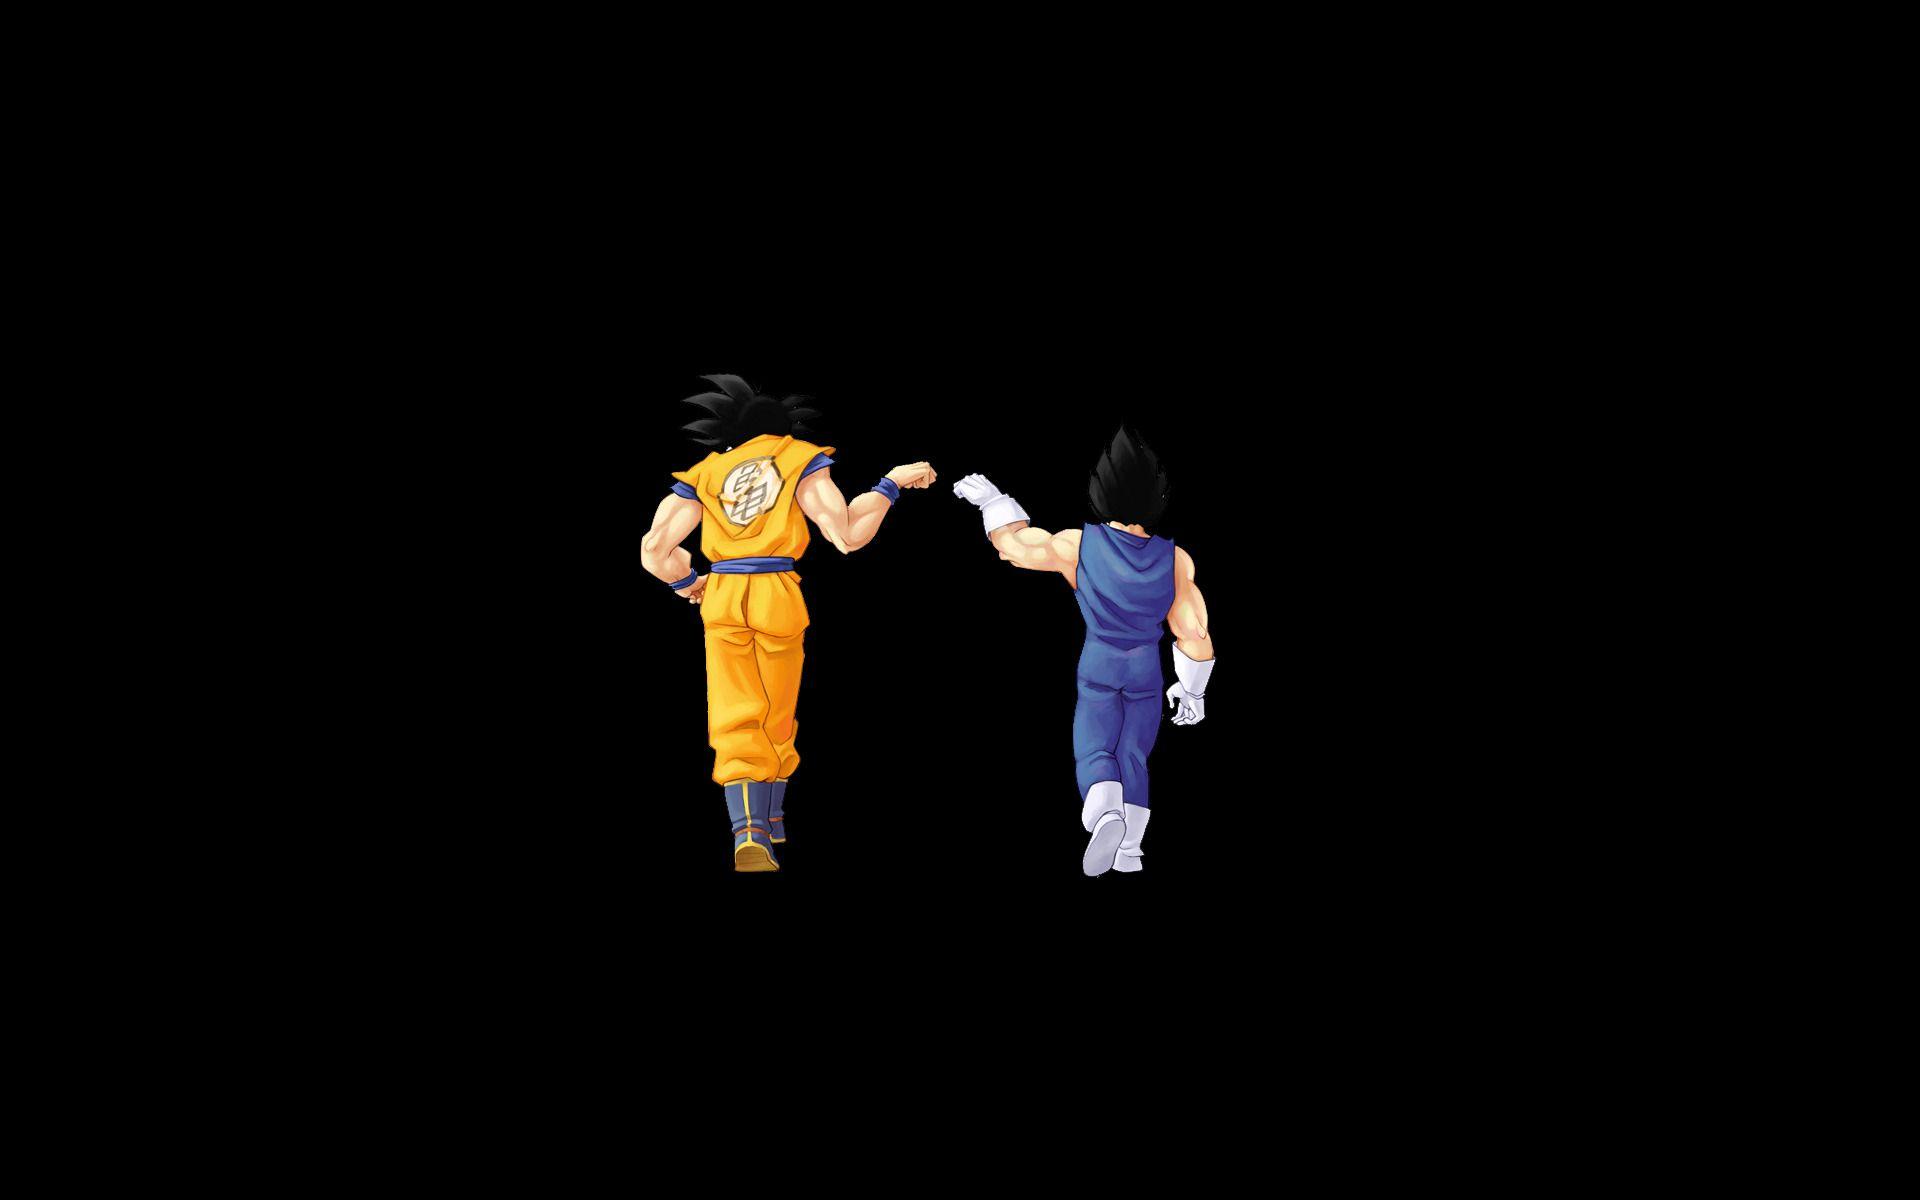 Dragon Ball Z Goku And Vegeta Black Background Wallpaper Dragon Ball Z Iphone Wallpaper Goku Wallpaper Dragon Ball Wallpapers